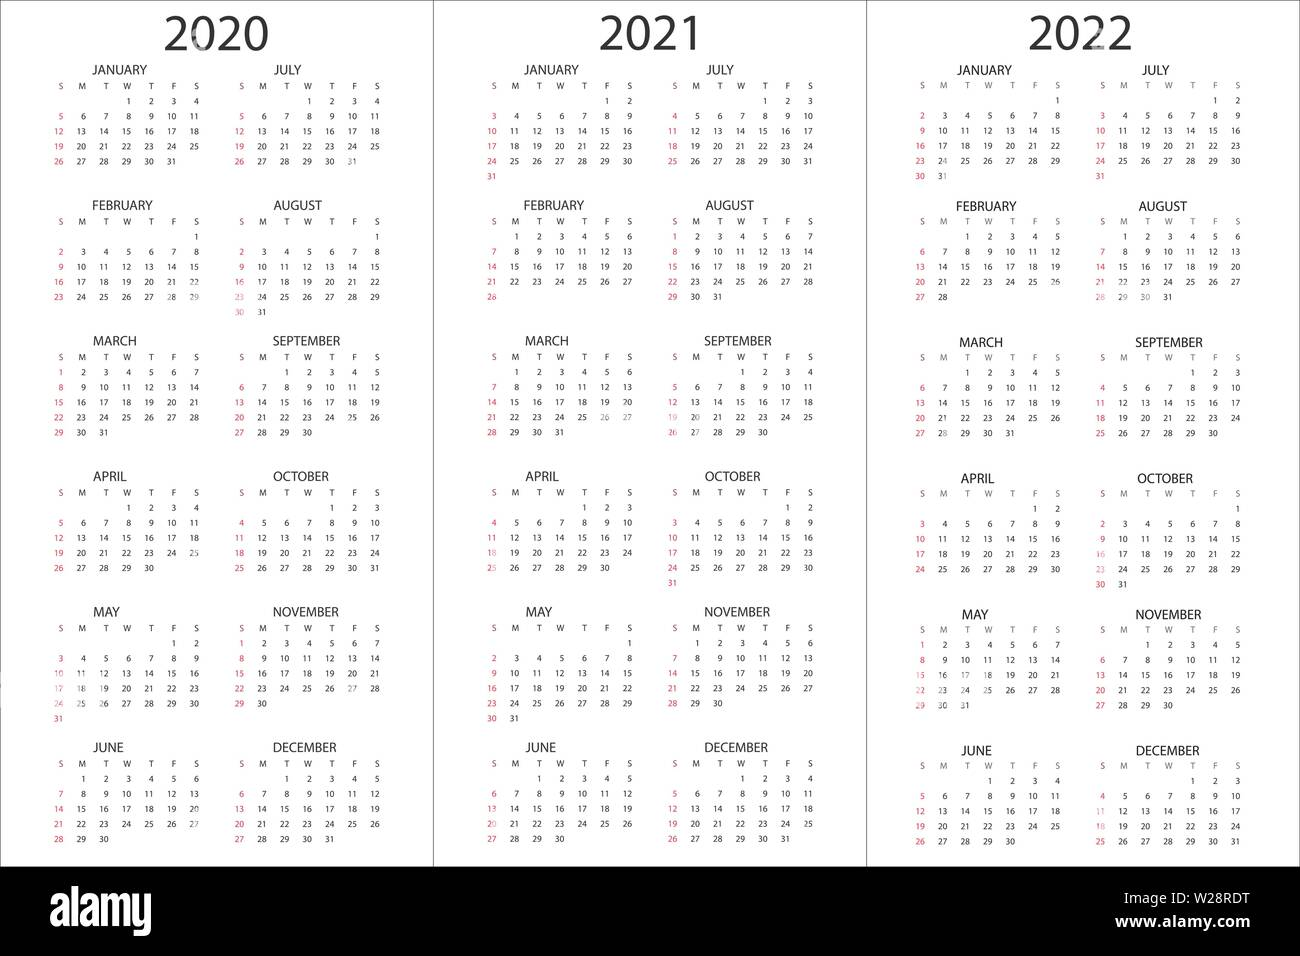 Calendar 2021-2022 Template Set of Calendars 2020, 2021, 2022 years, simple design template